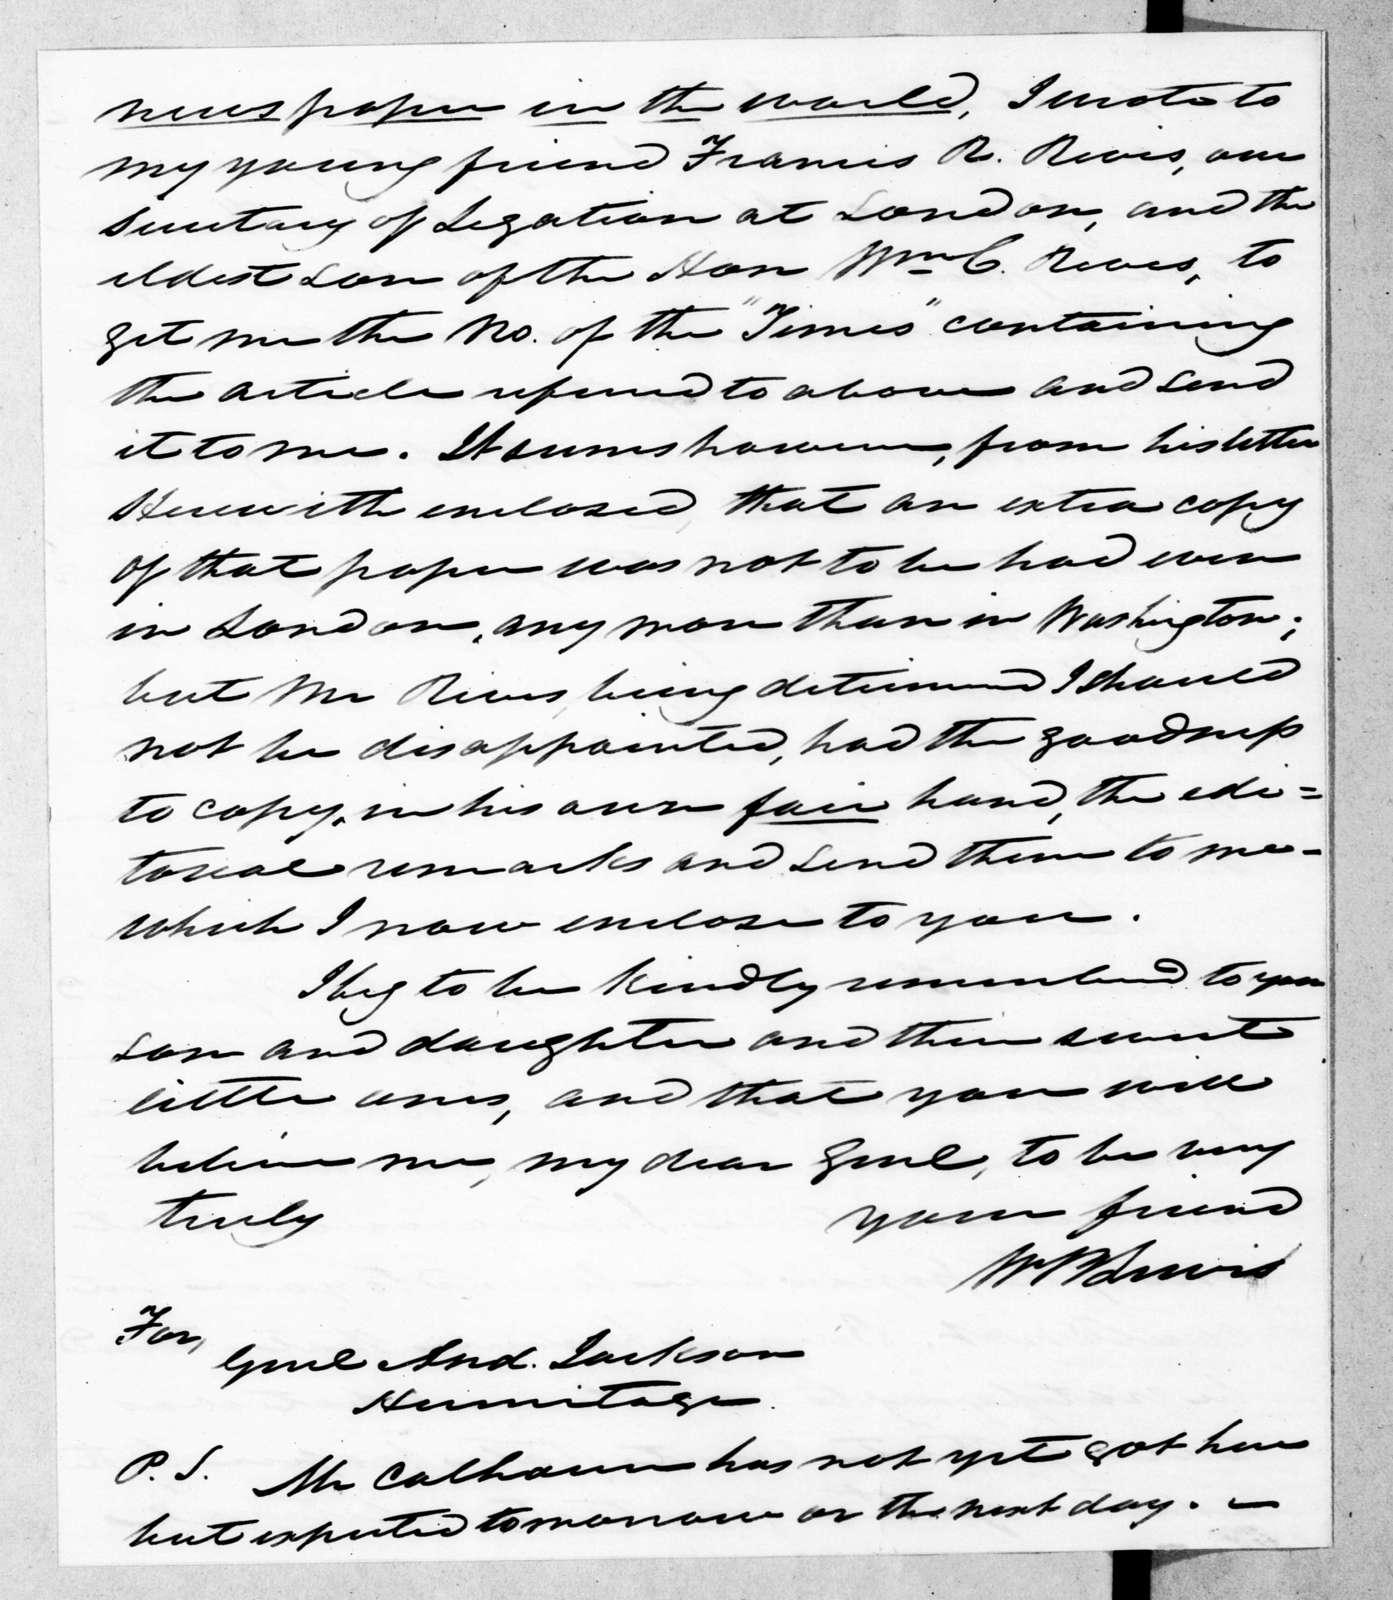 William Berkeley Lewis to Andrew Jackson, March 28, 1844